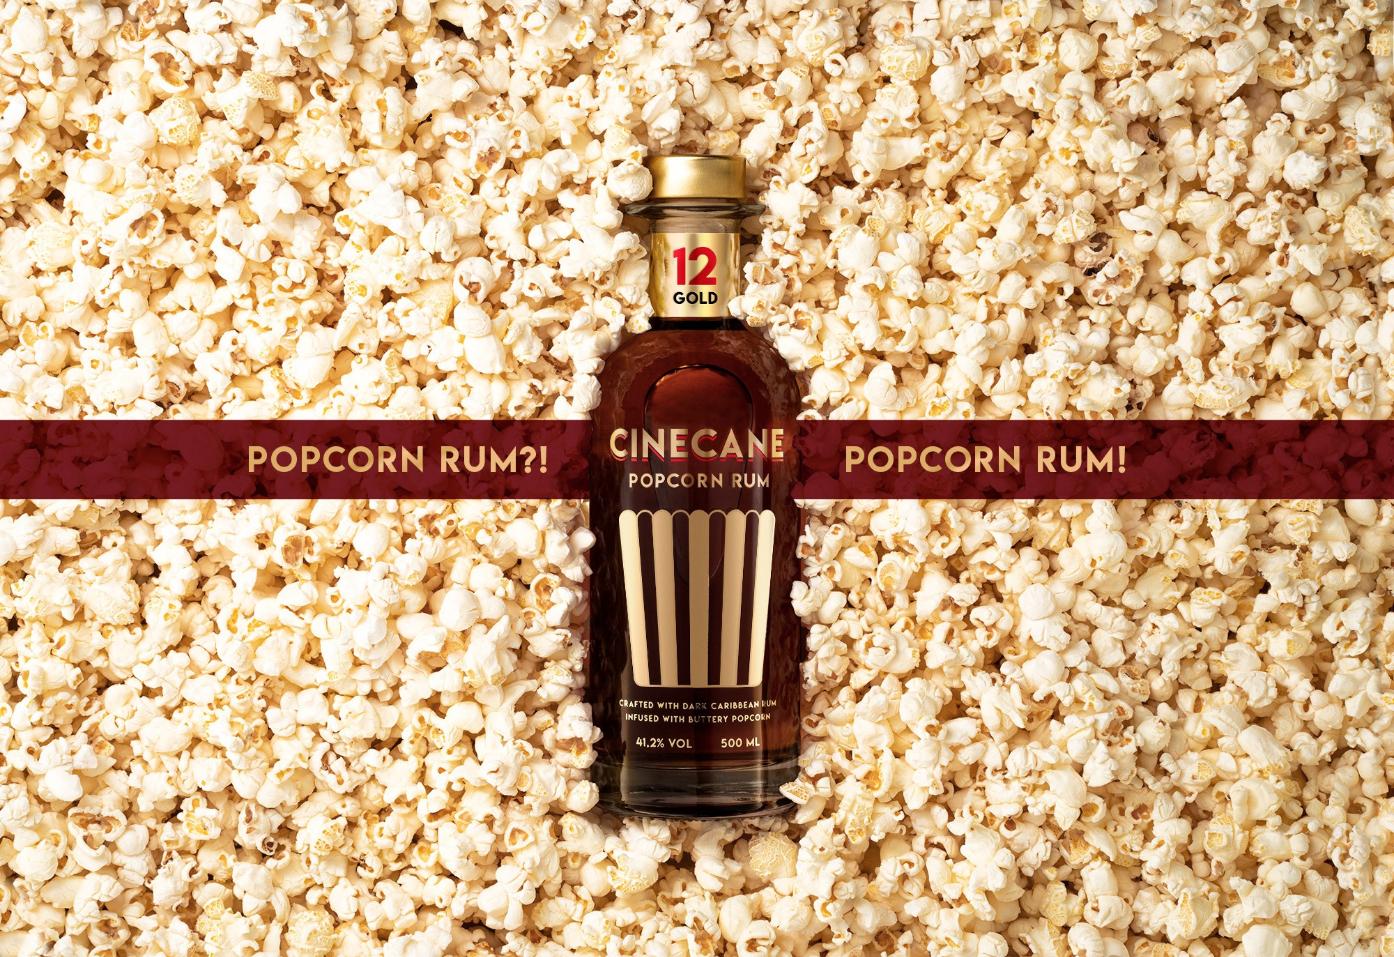 Tastillery Cinecane Popcorn Rum